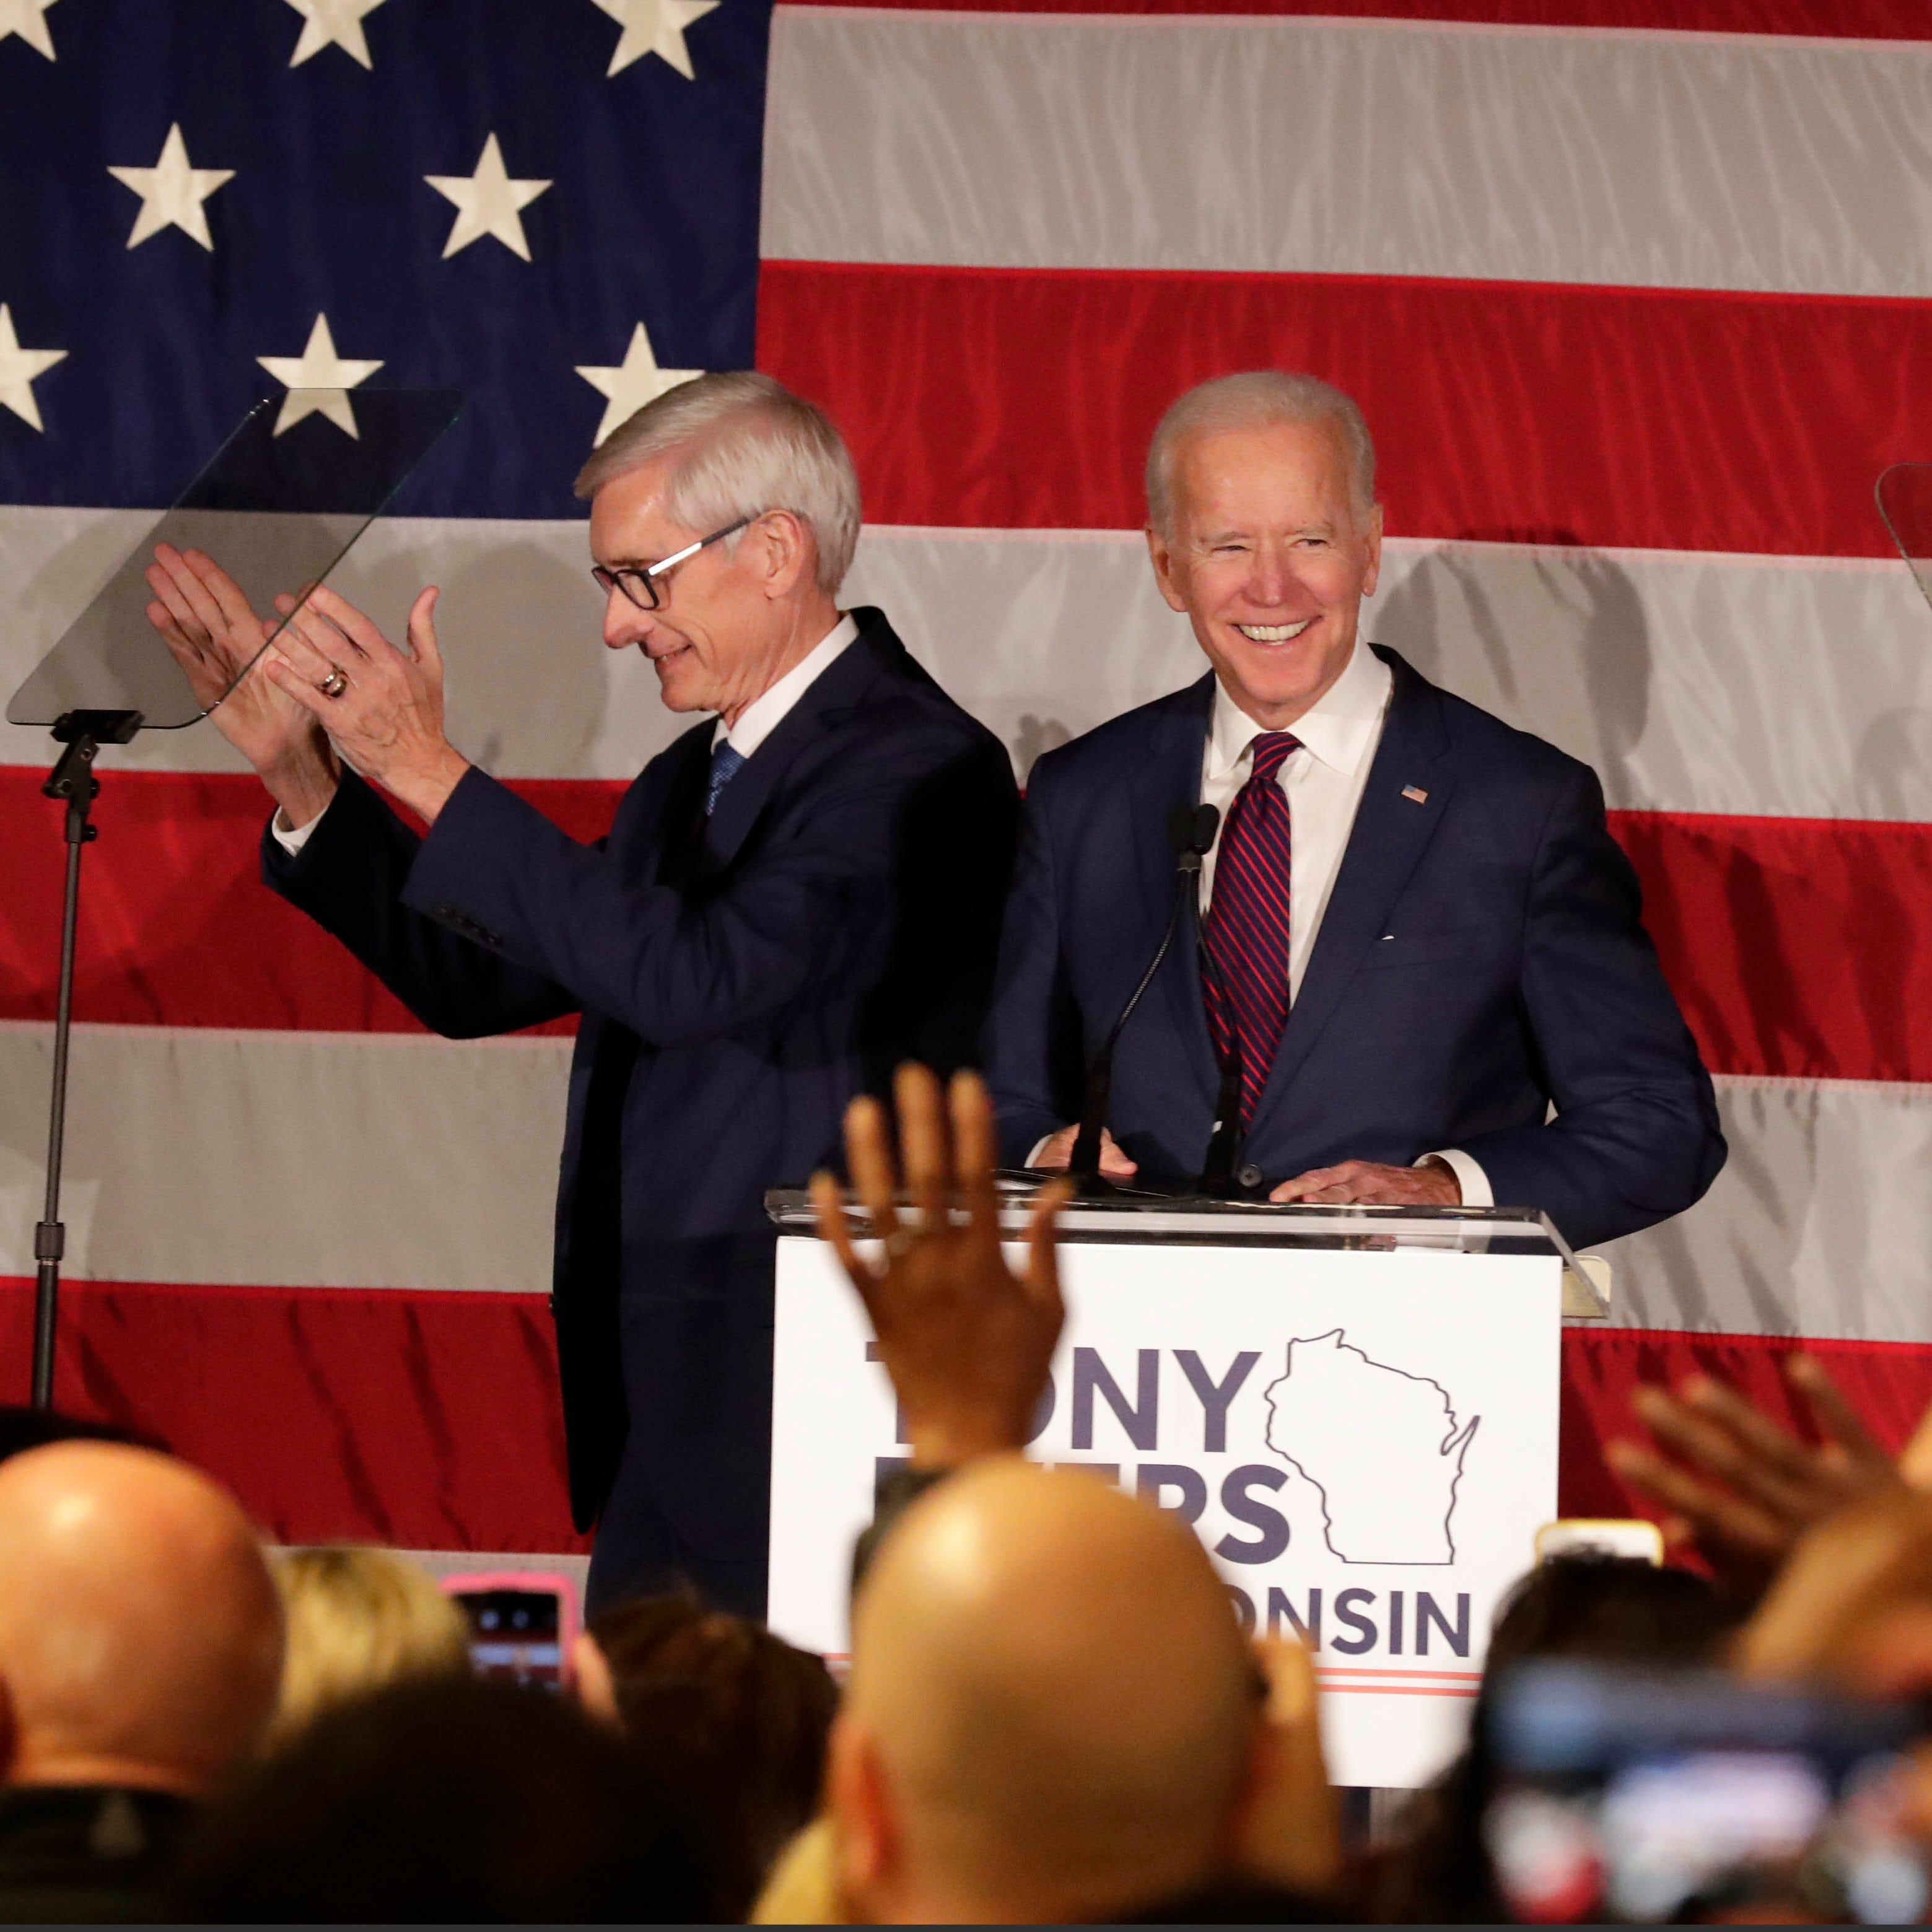 Joe Biden campaigns for Tammy Baldwin, Tony Evers: 'We're in a battle for America's soul'